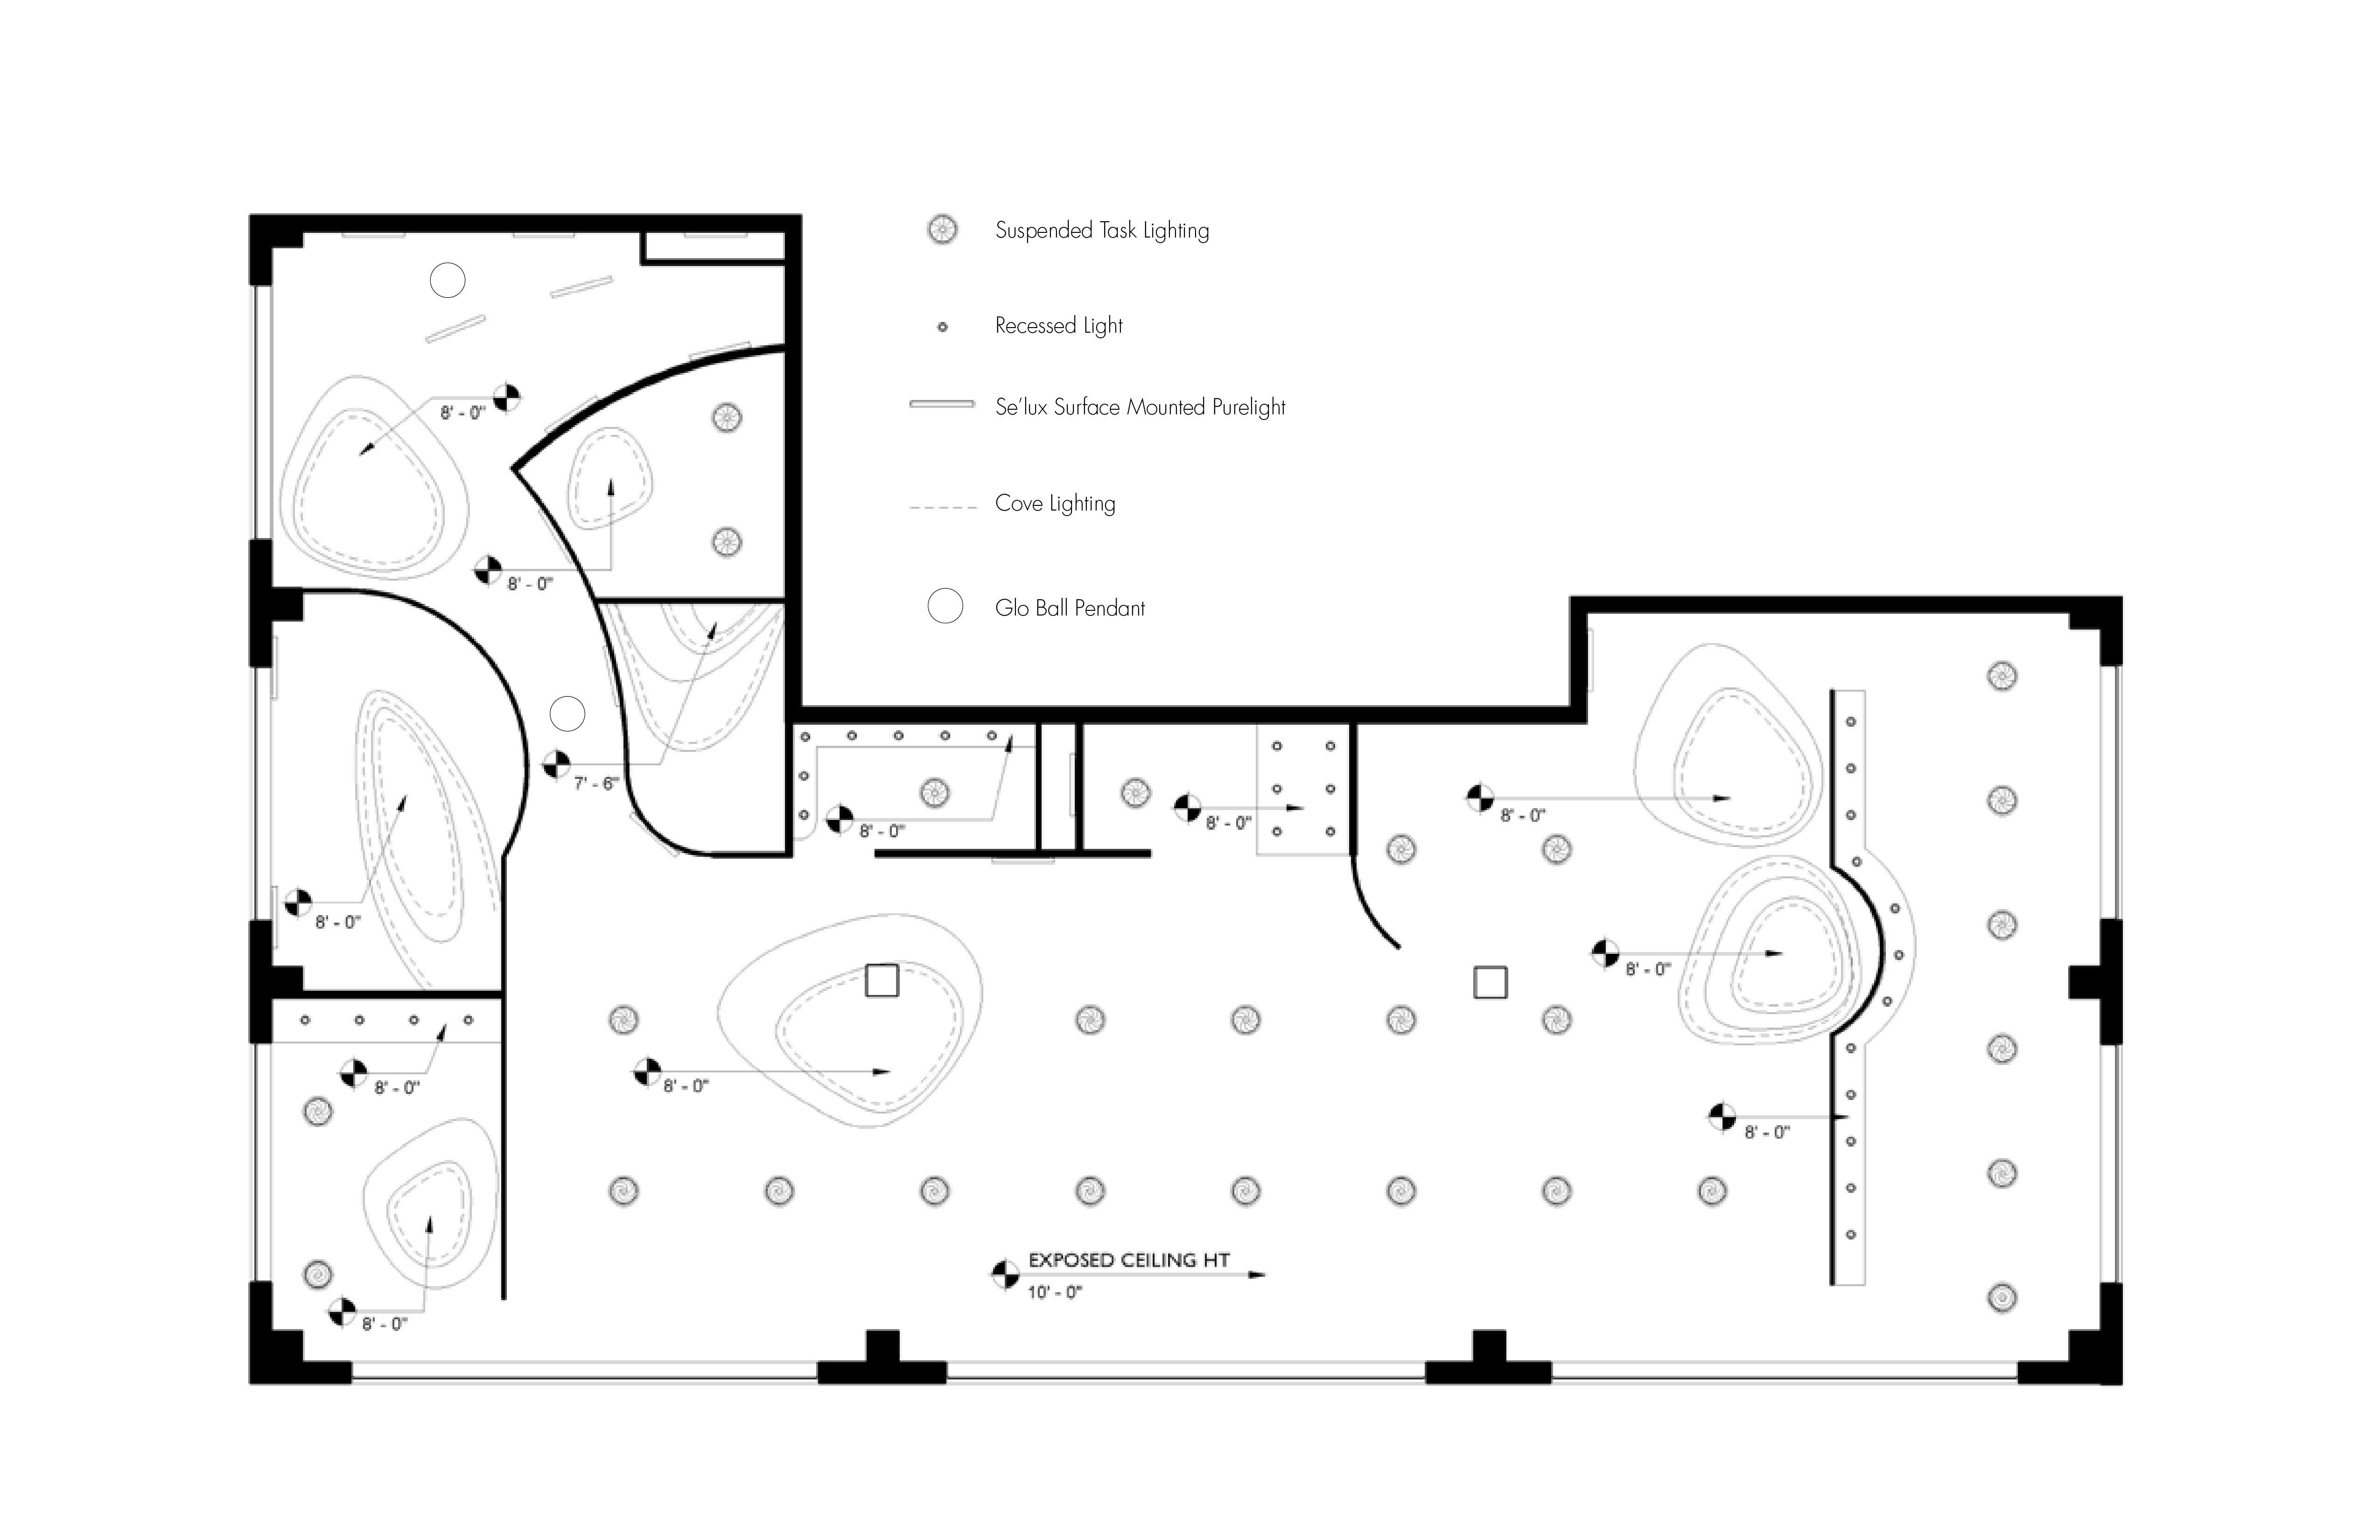 f3b5d50a392fb348e8bb20bc855e6420 reflected ceiling plan id 375 reflected ceiling plan,Lighting Plan For House